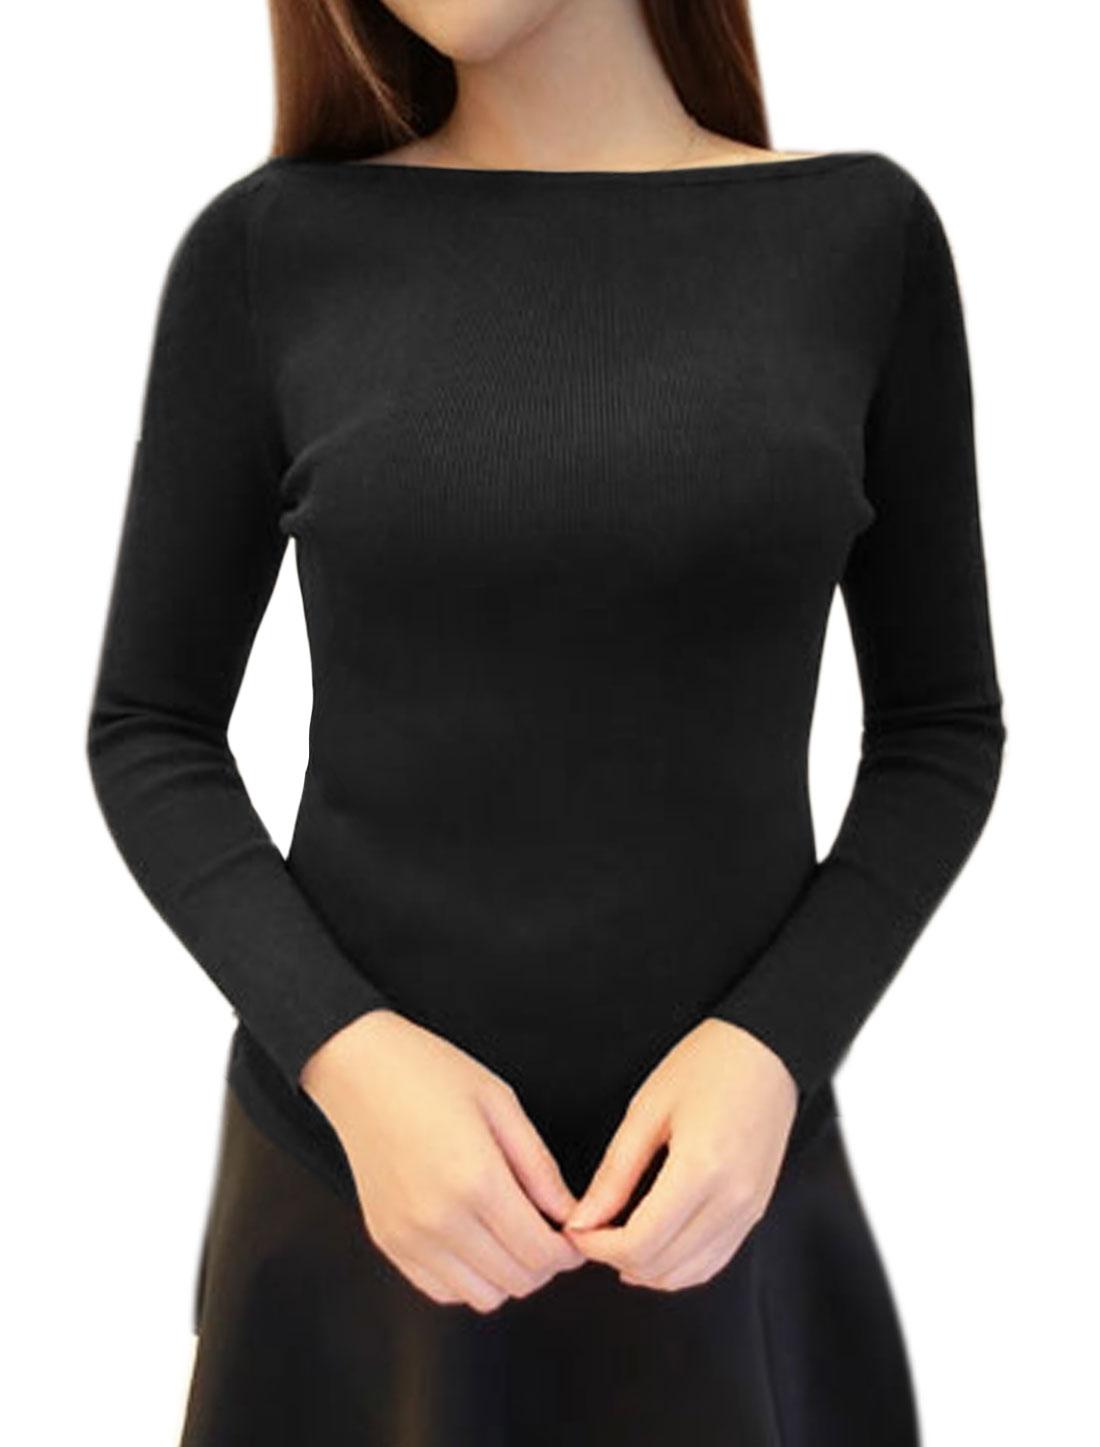 Women Irregular Hem Boat Neck Stretchy Slim Fit Knit Top Black XS